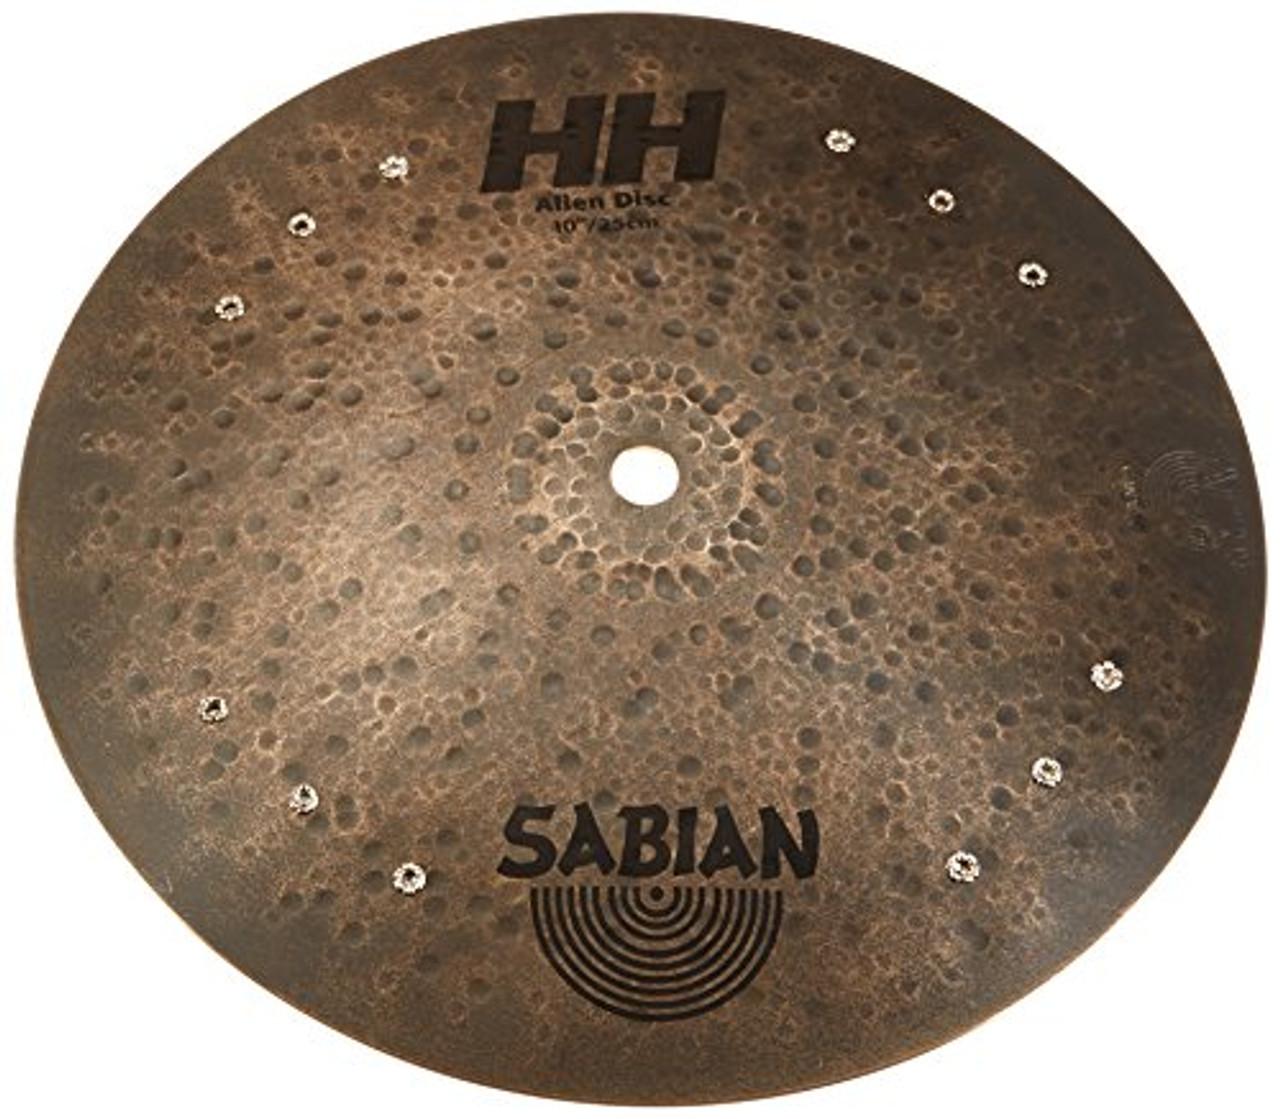 "Sabian 10"" ALIEN DISC HH"